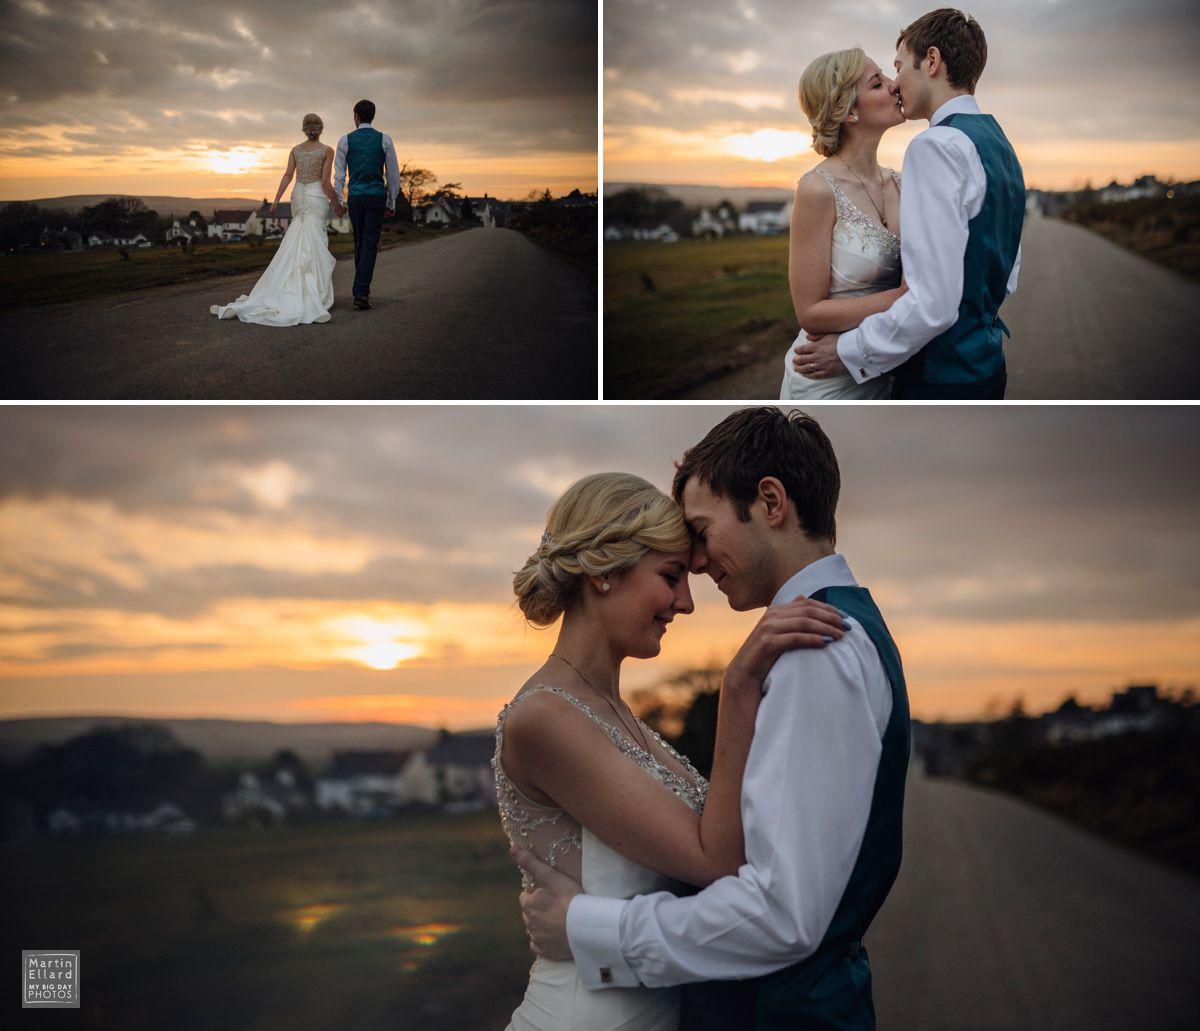 natural sunset wedding photography